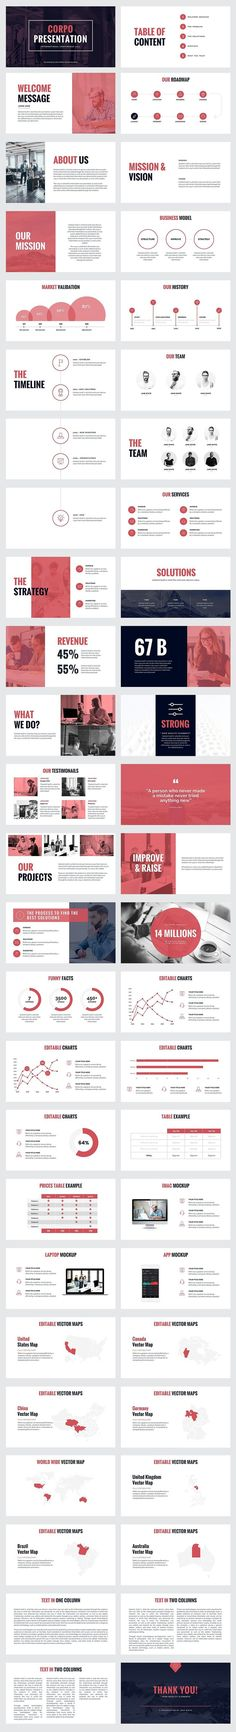 business powerpoint template #presentation